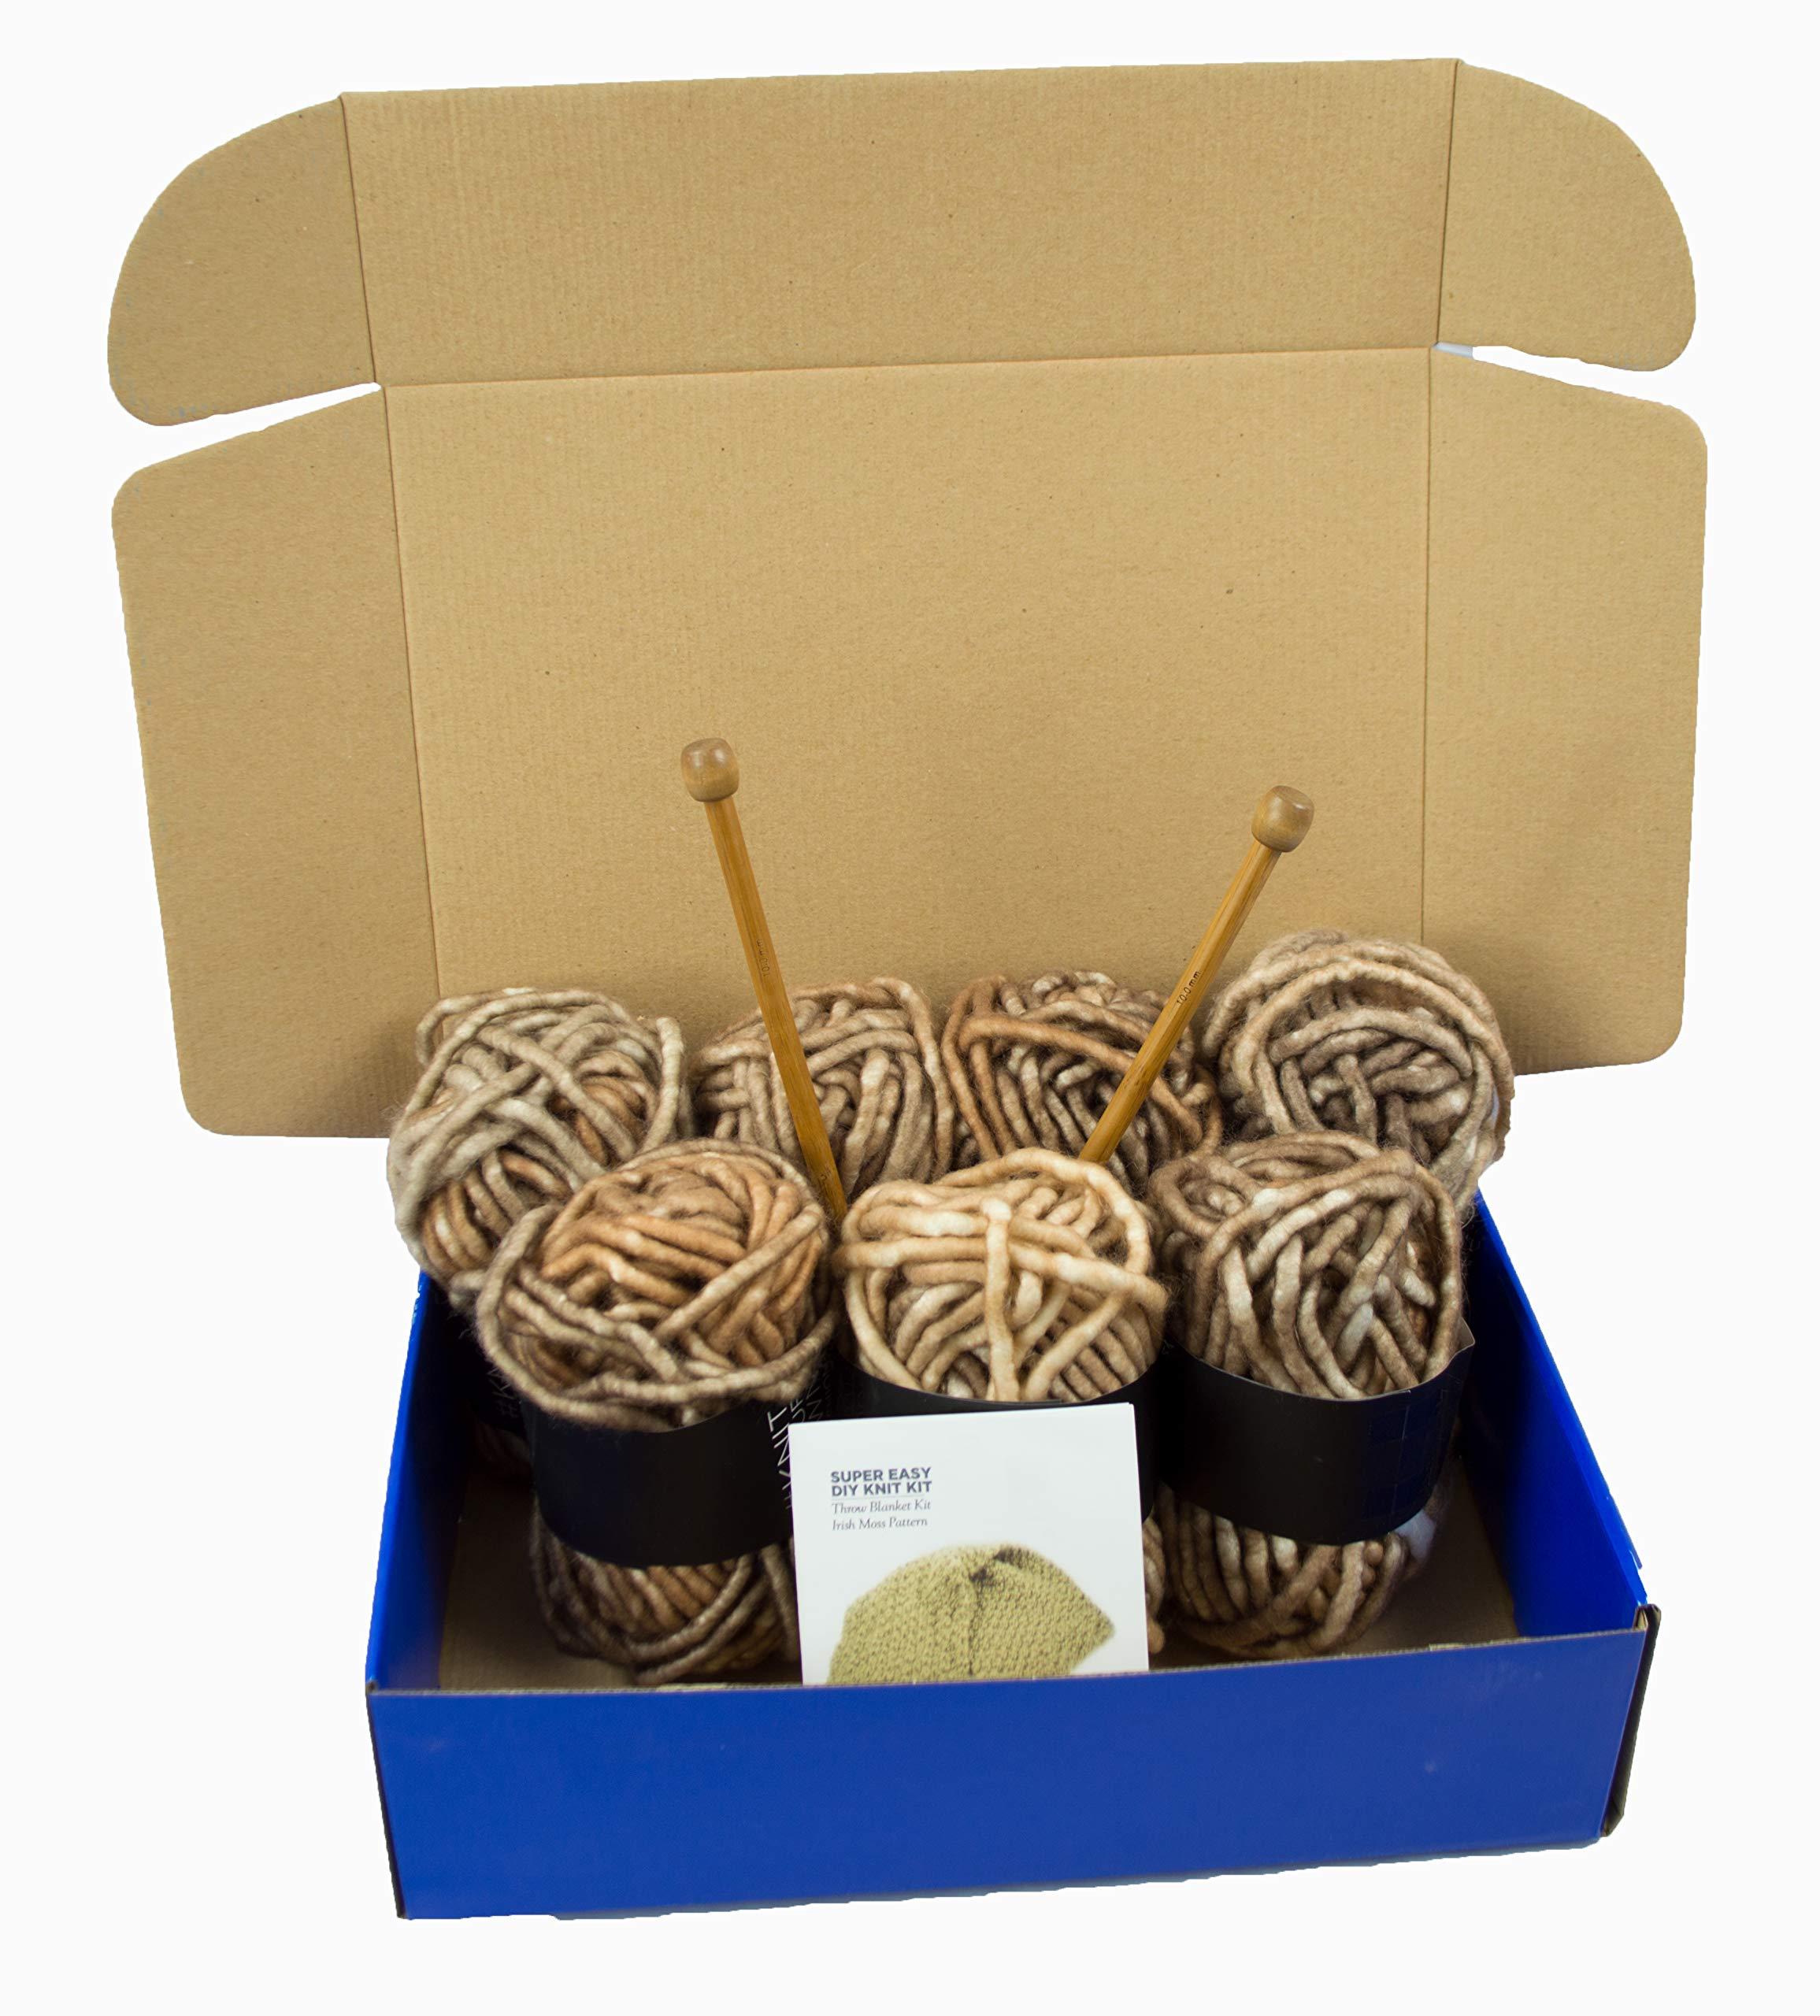 Chunky Knit DIY Throw Blanket Knitting Kit, Super Soft Yarn, US15 10mm Wood Needles (Marled Brown)